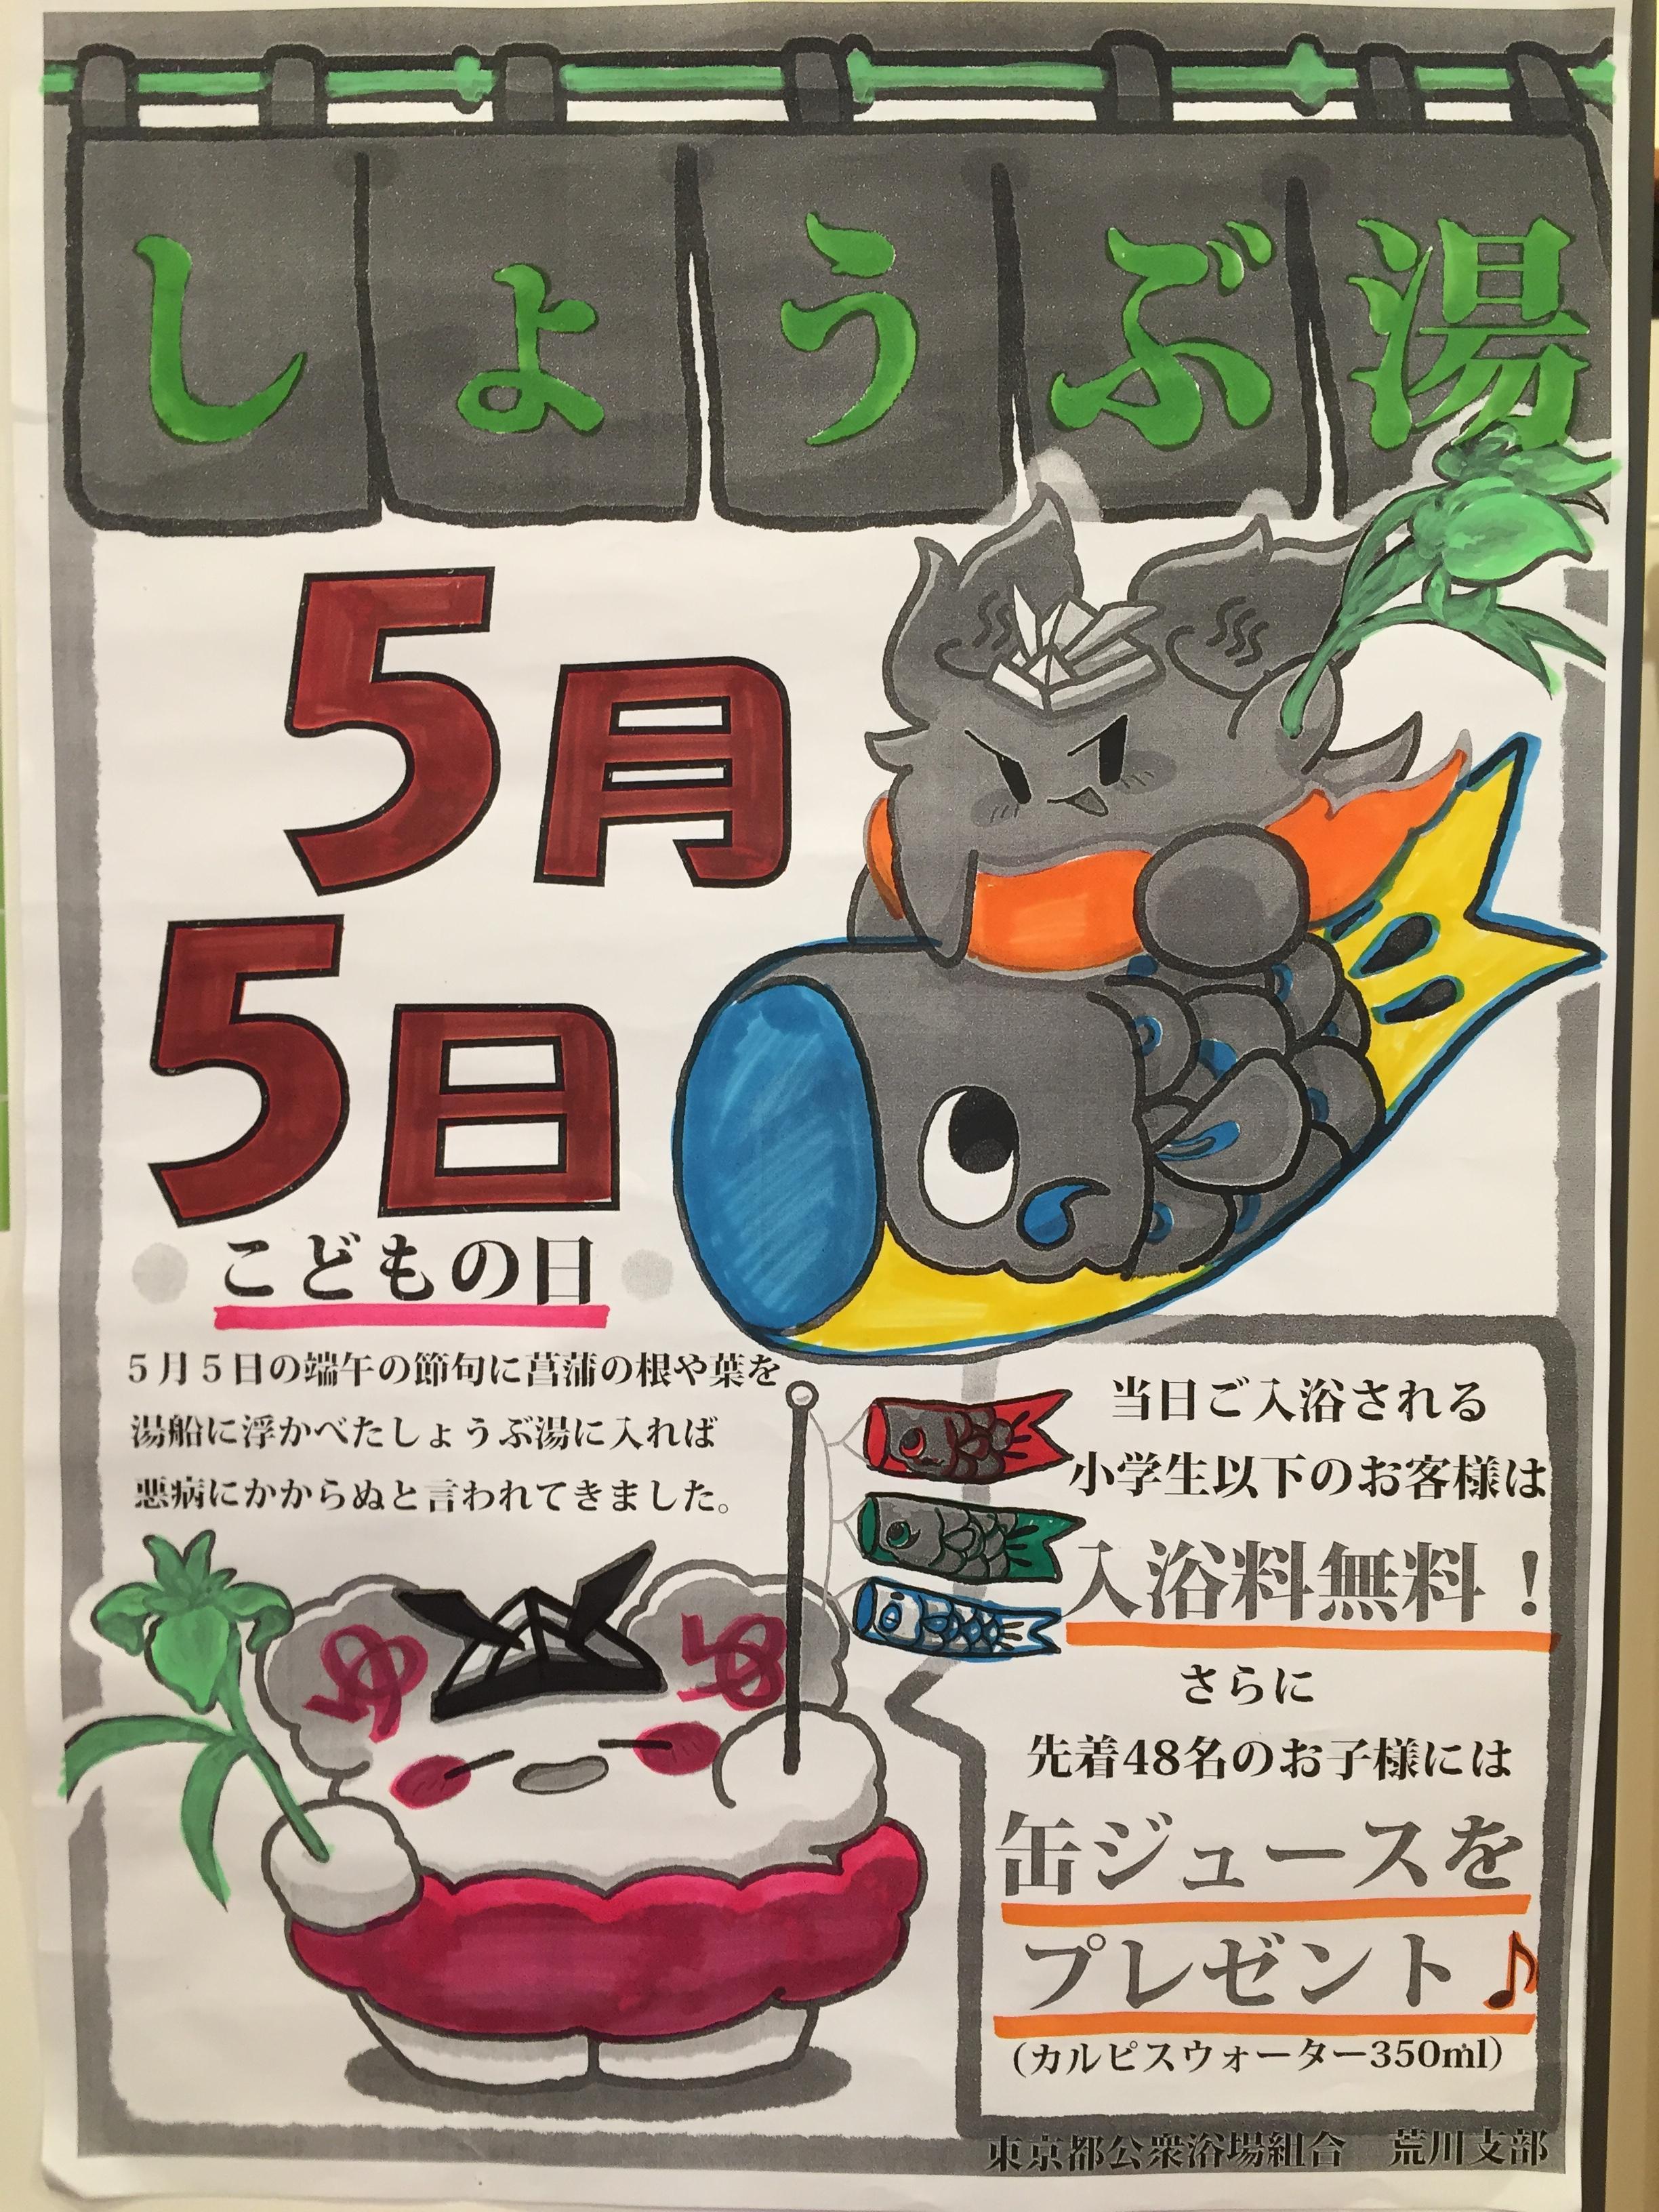 http://www.saito-yu.com/blog/ffef4101ee4abfd2ff96c25b3f46557b665a16d5.jpeg